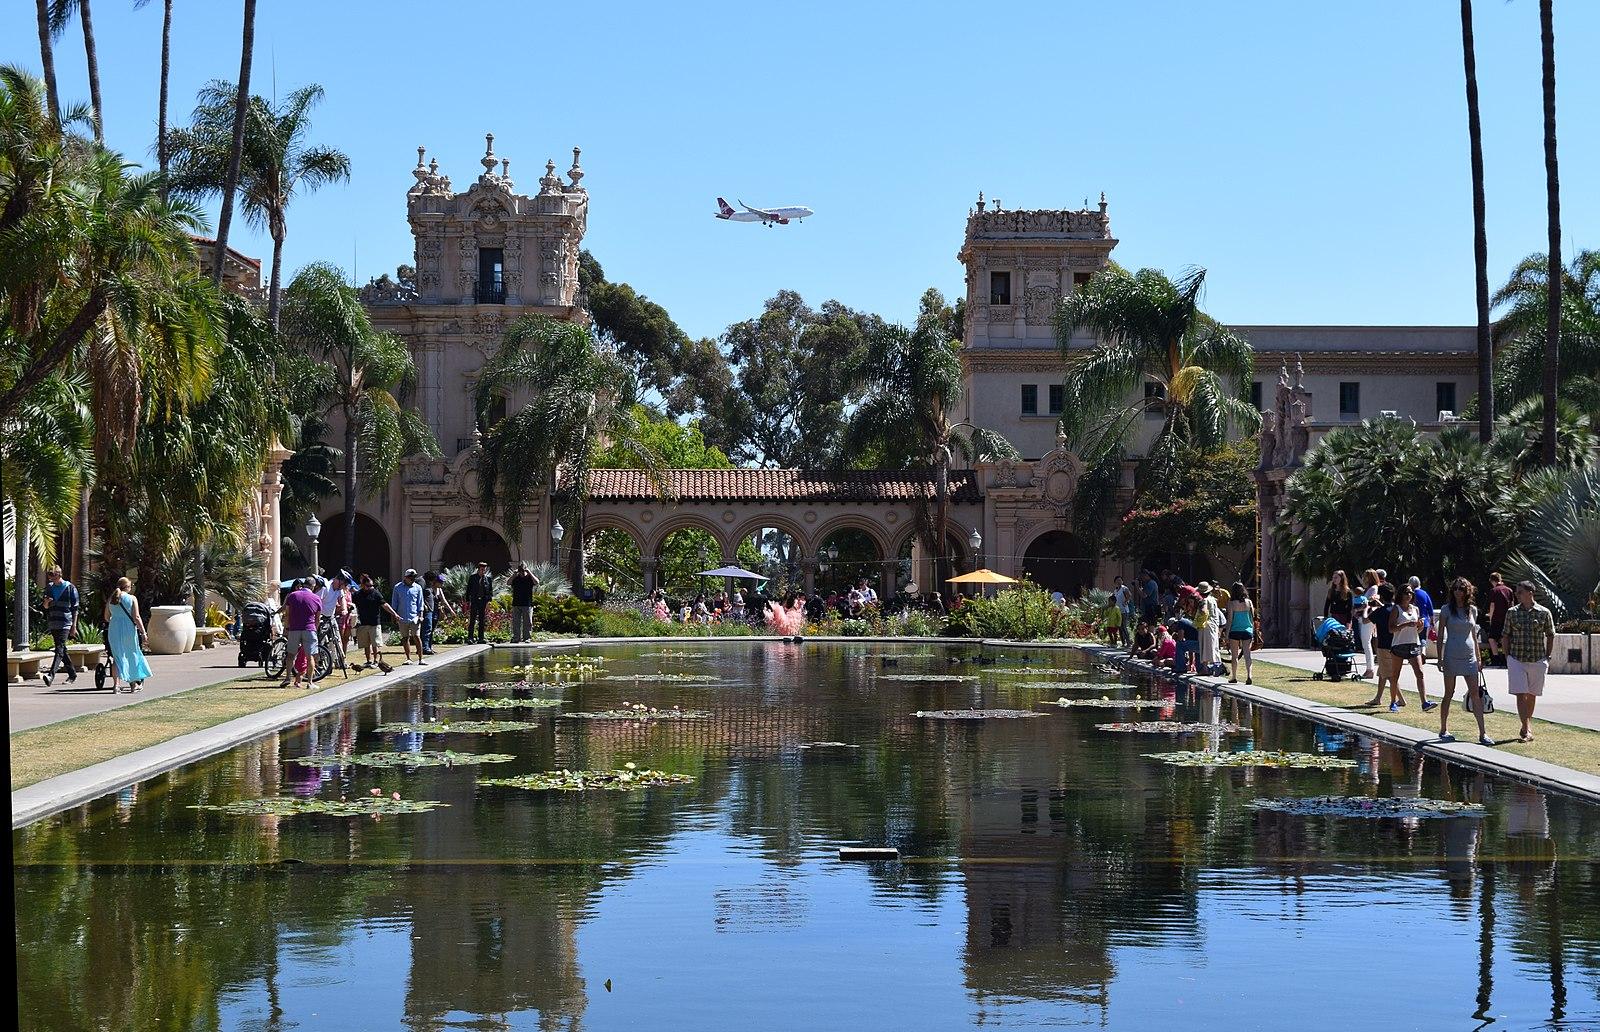 Wander through enchanting Balboa Park